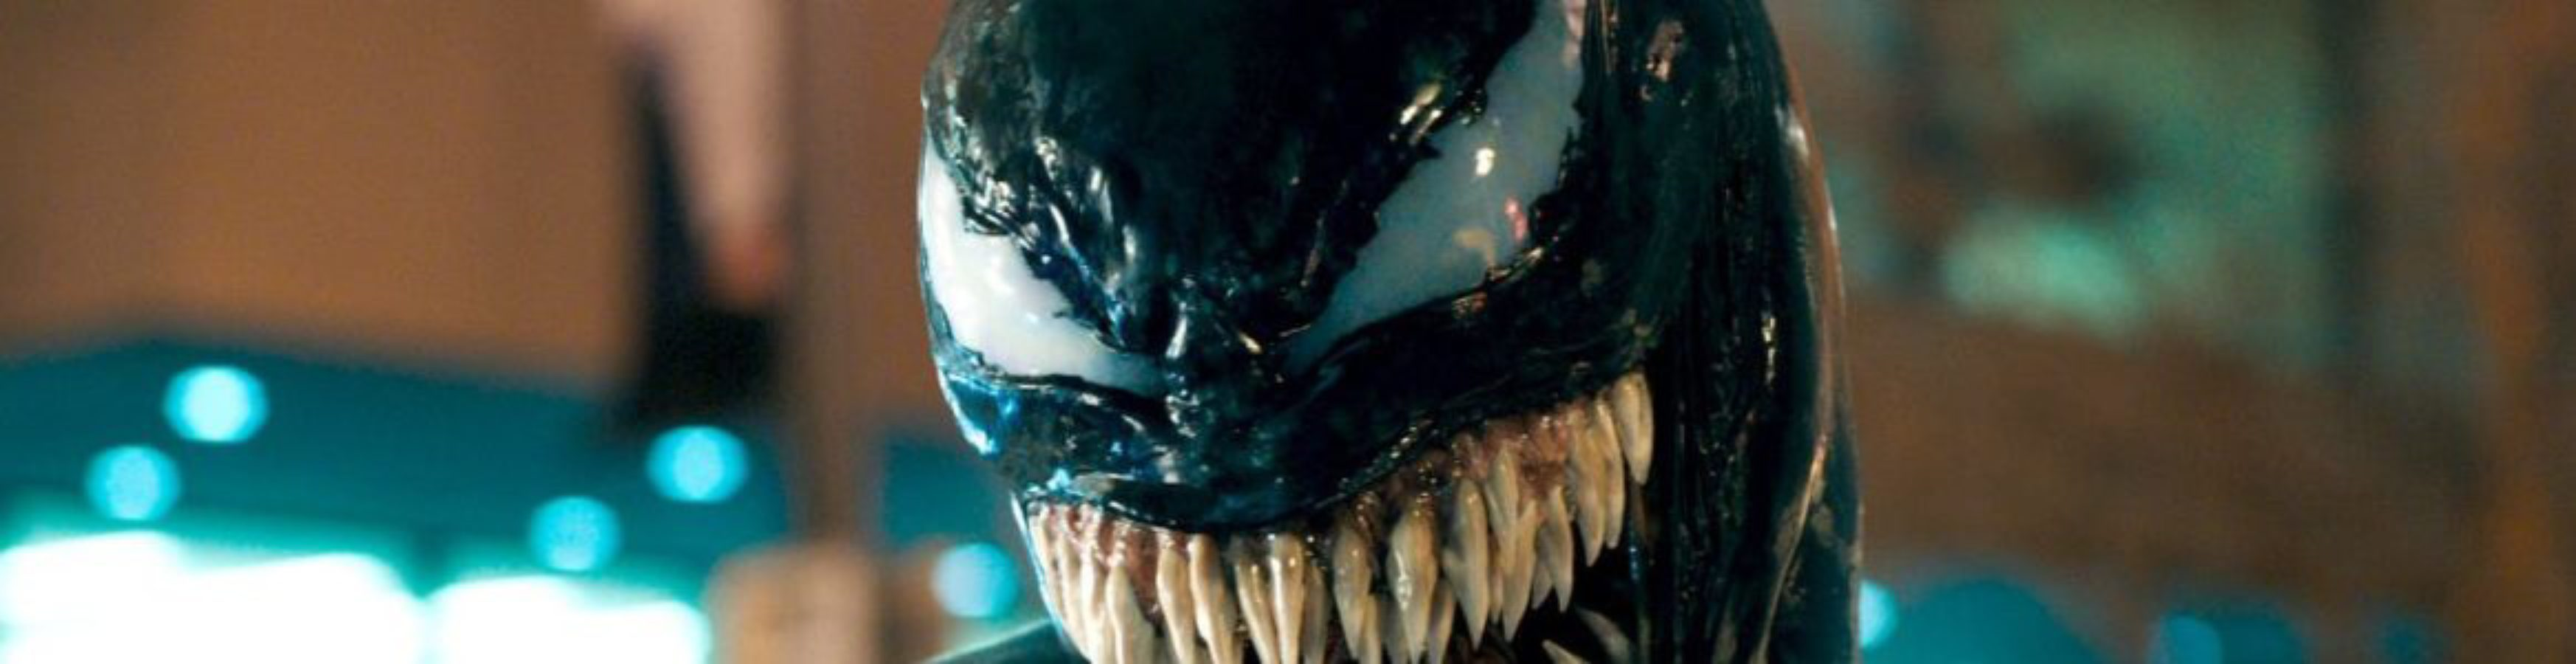 Venom Trailer 2 Breakdown - Things Missed & Easter Eggs ...